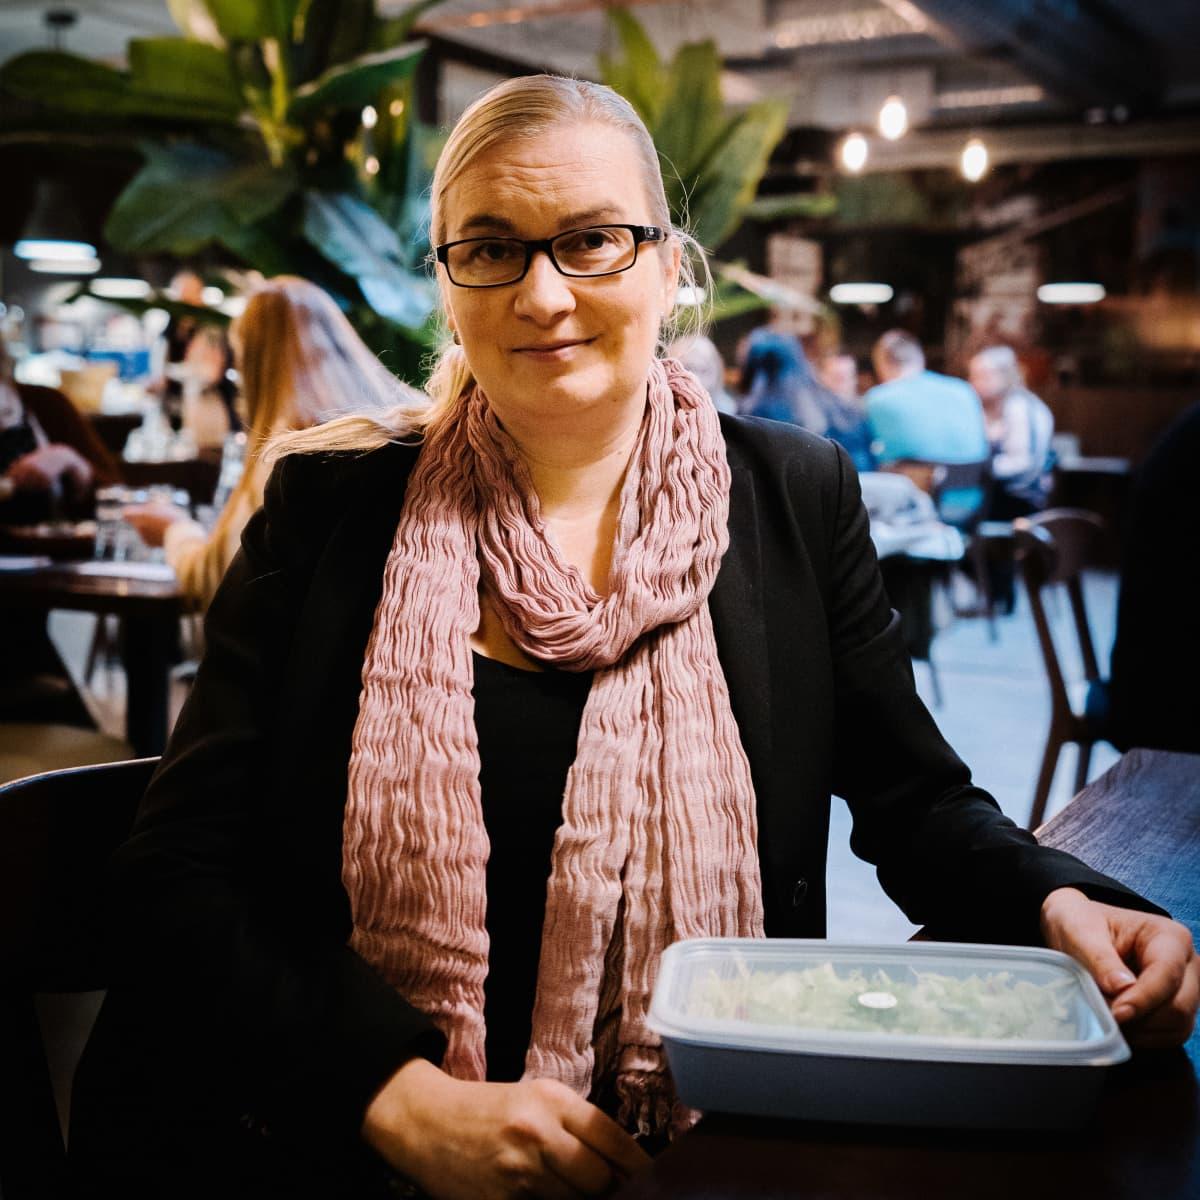 Johanna Kohvakka, Espoo, 10.10.2019